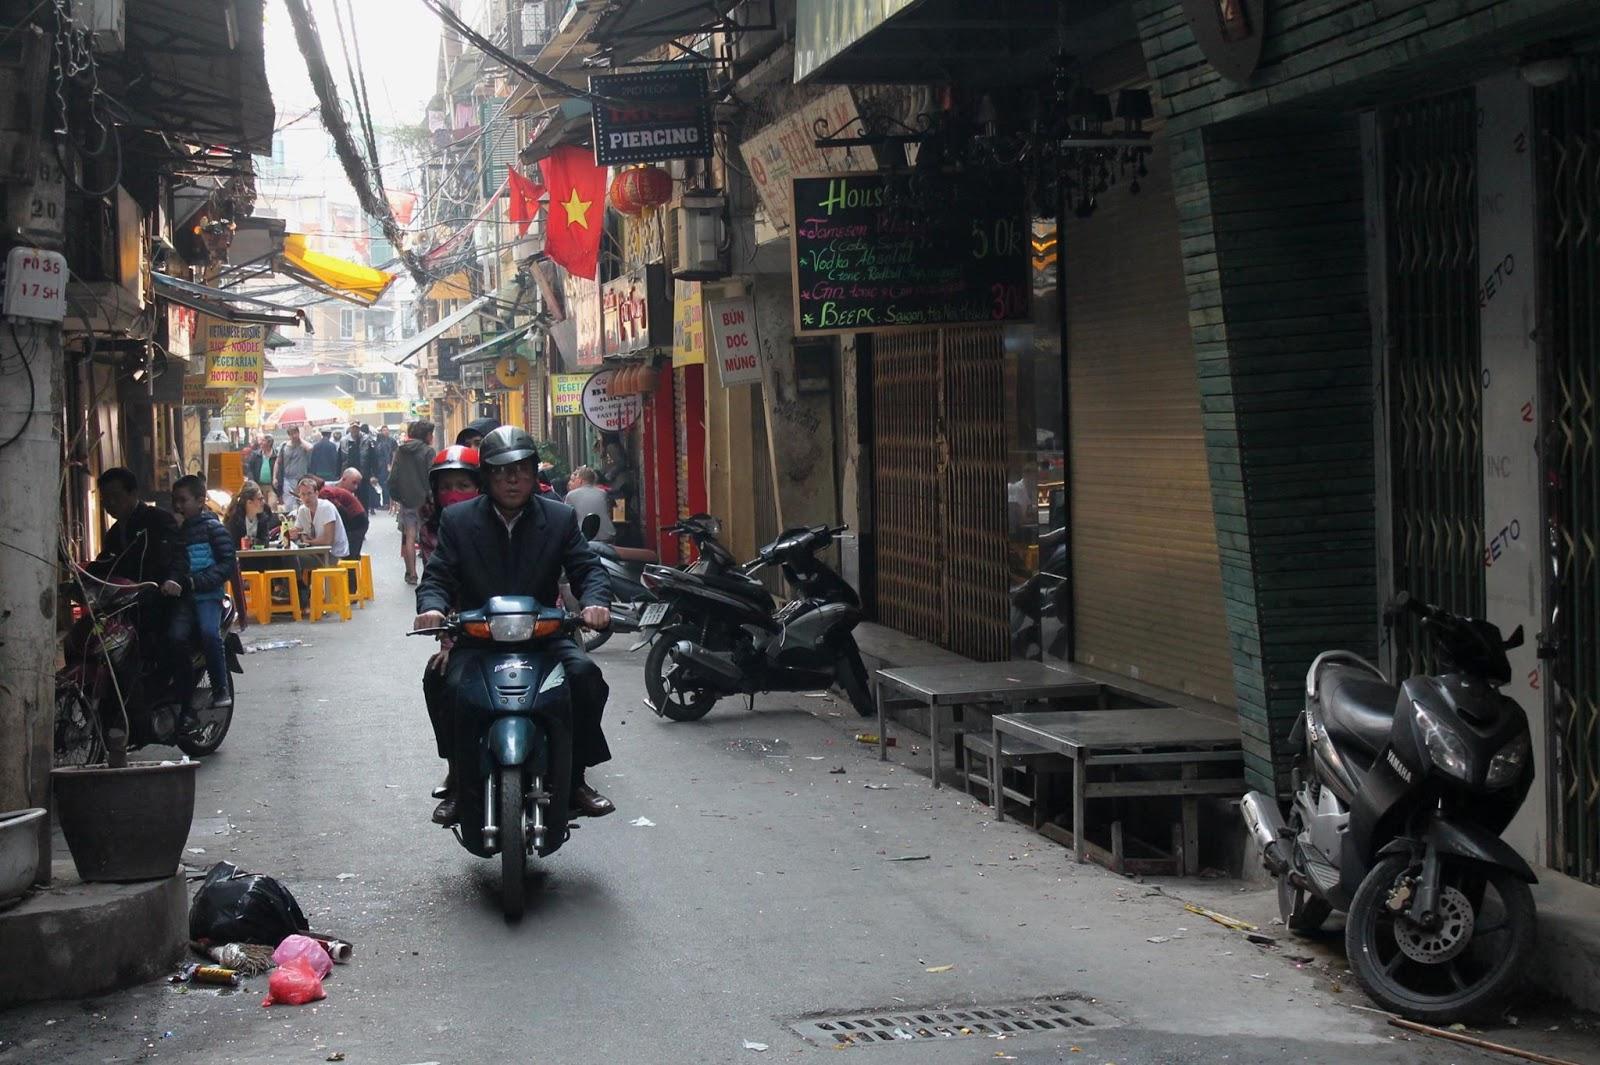 centro storico di hanoi vietnam